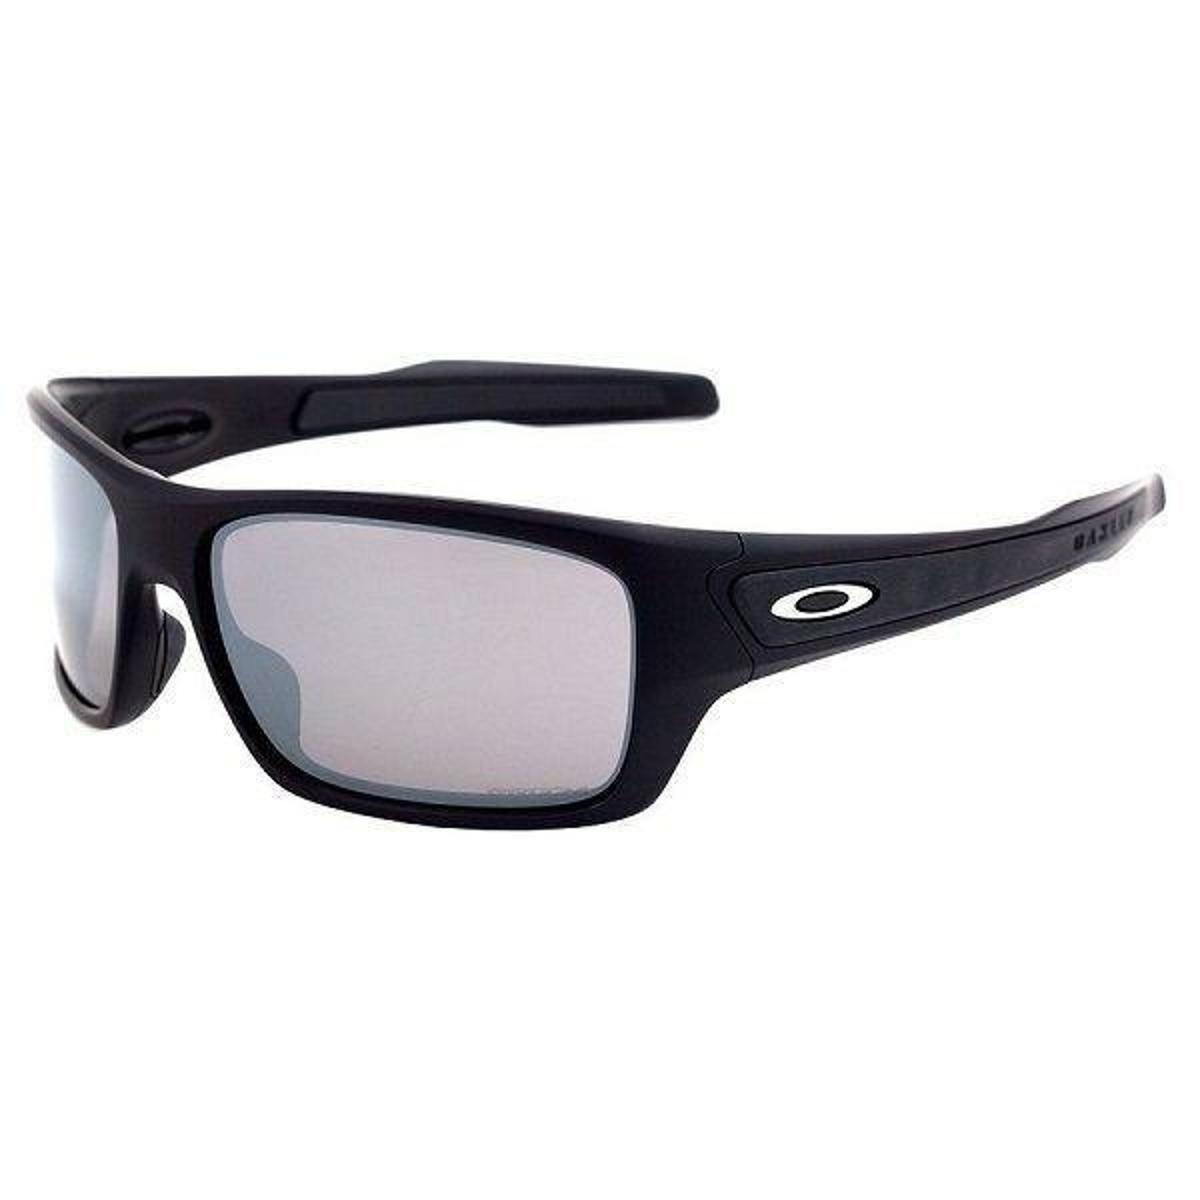 631d9d32c07bd Óculos de Sol Holbrook Turbine Prizm Polarizado Oakley - Compre ...